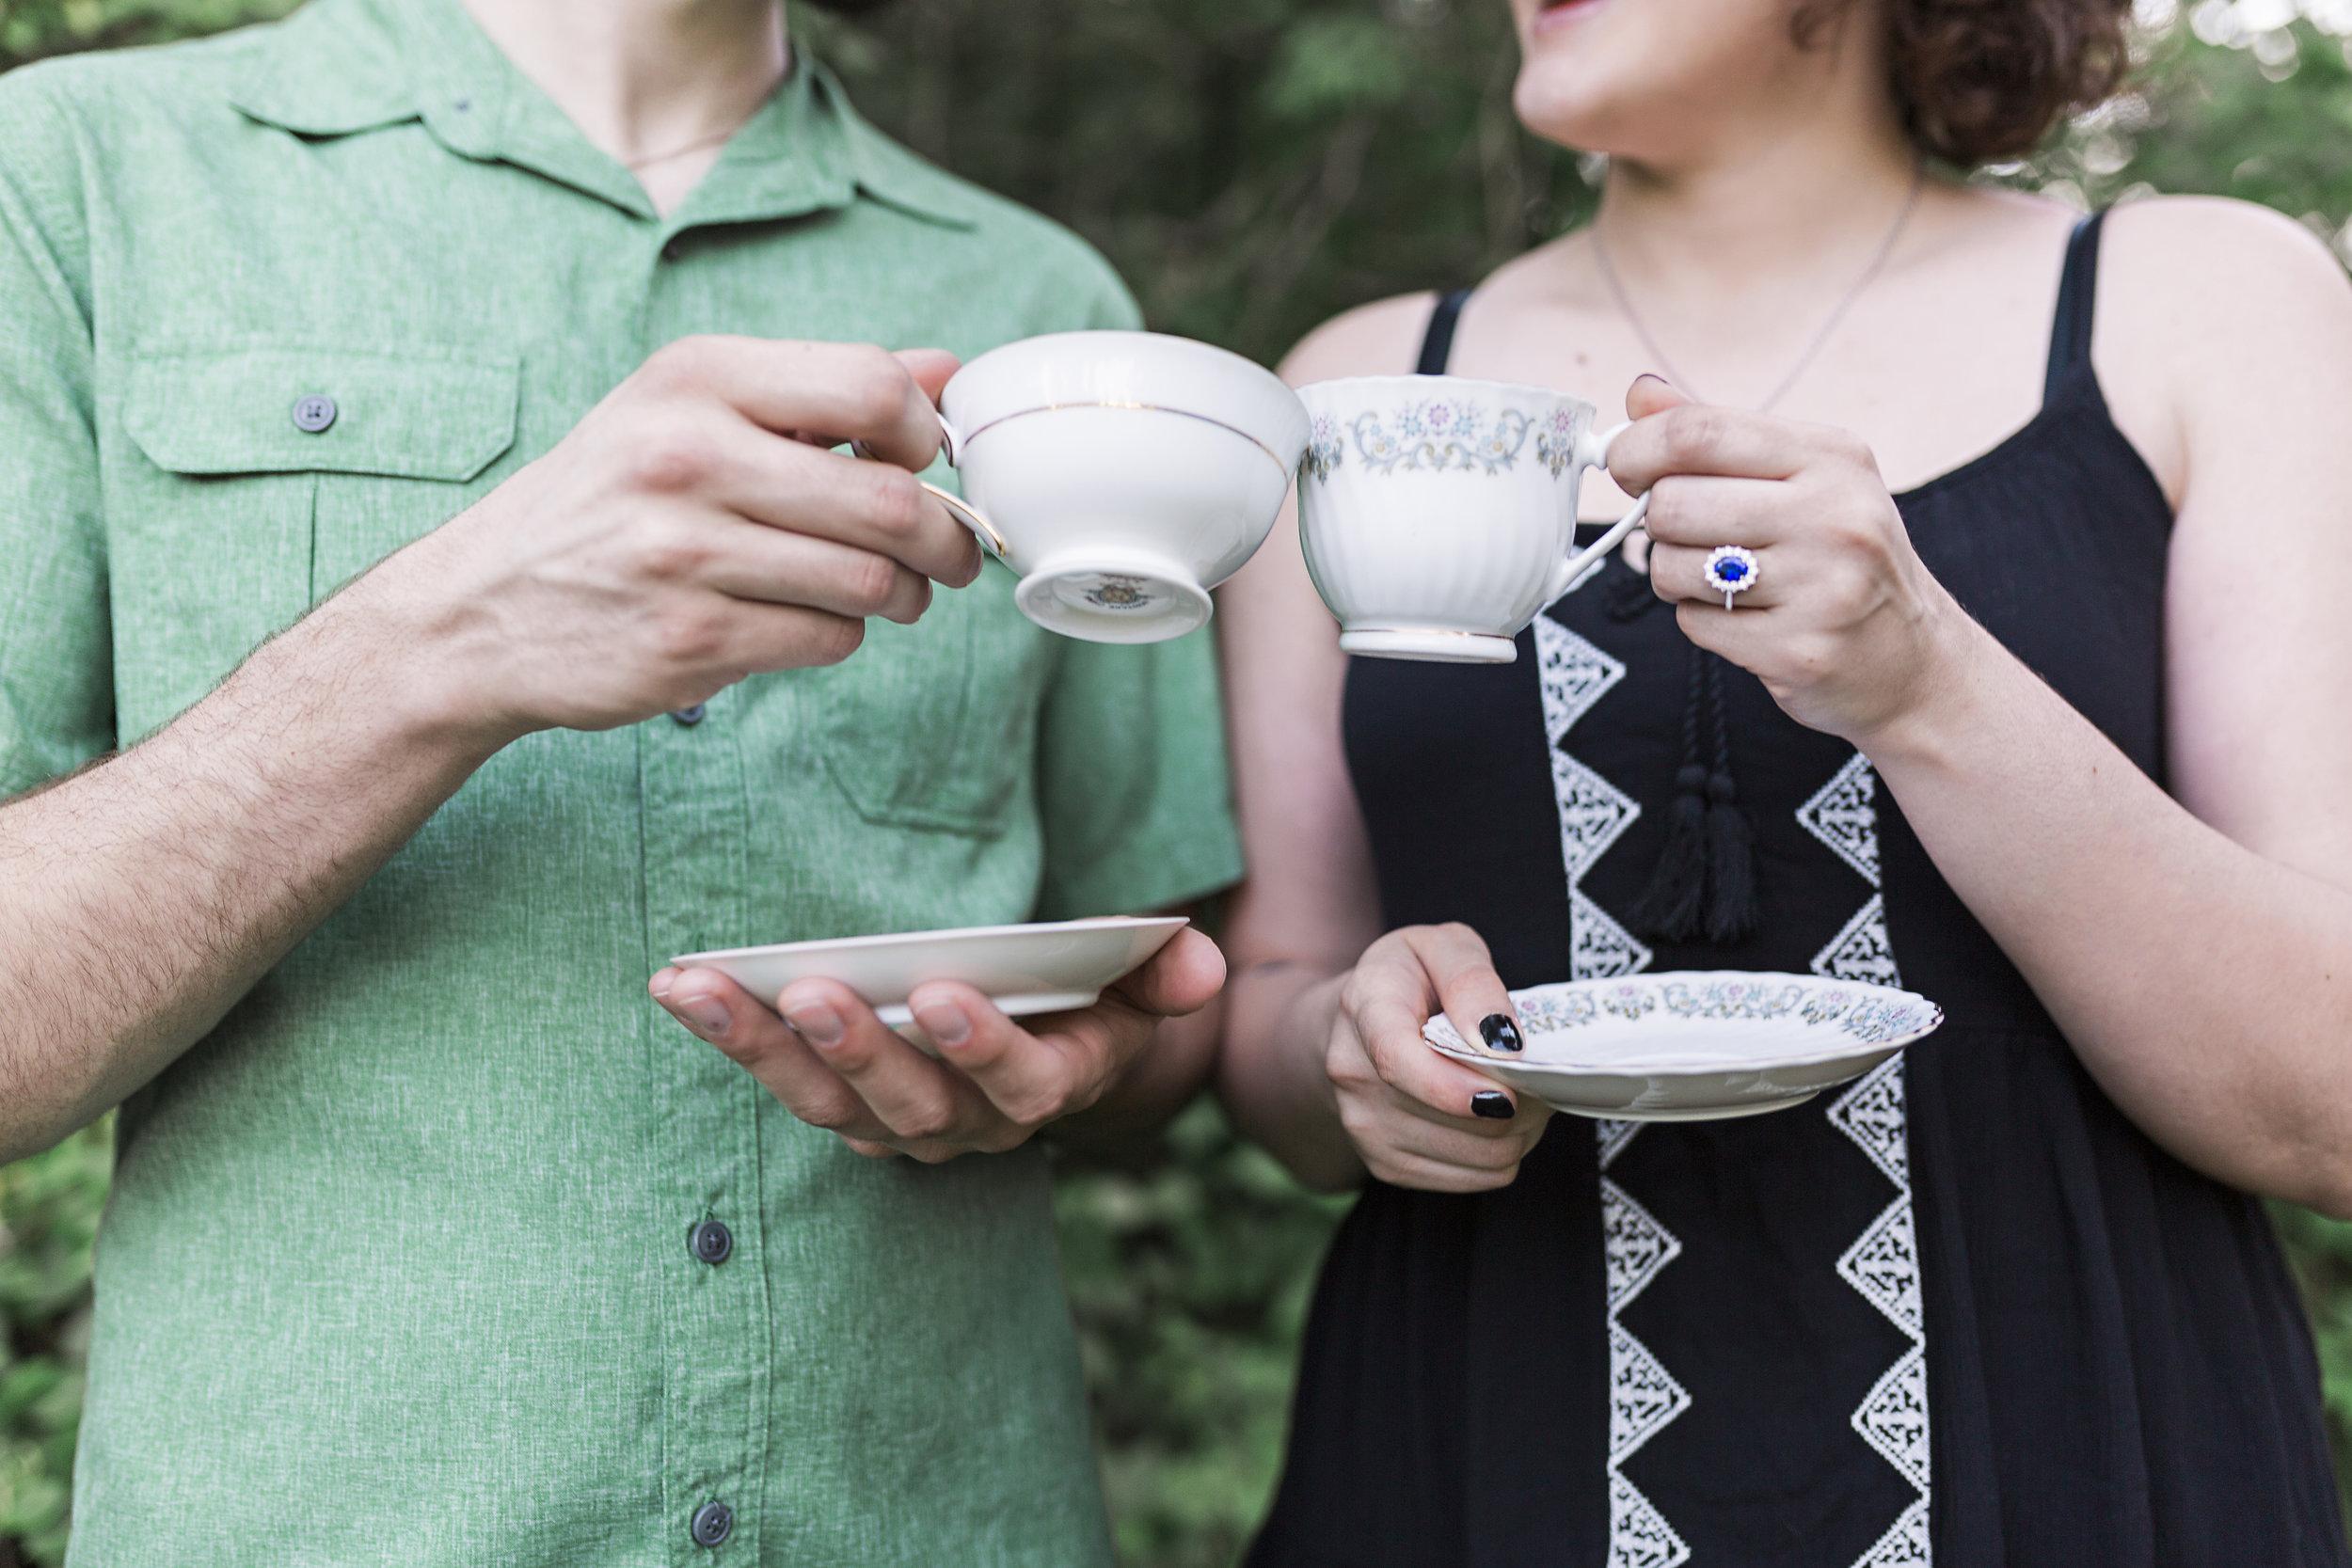 jeffersoncity-photographer-engagement-teaparty